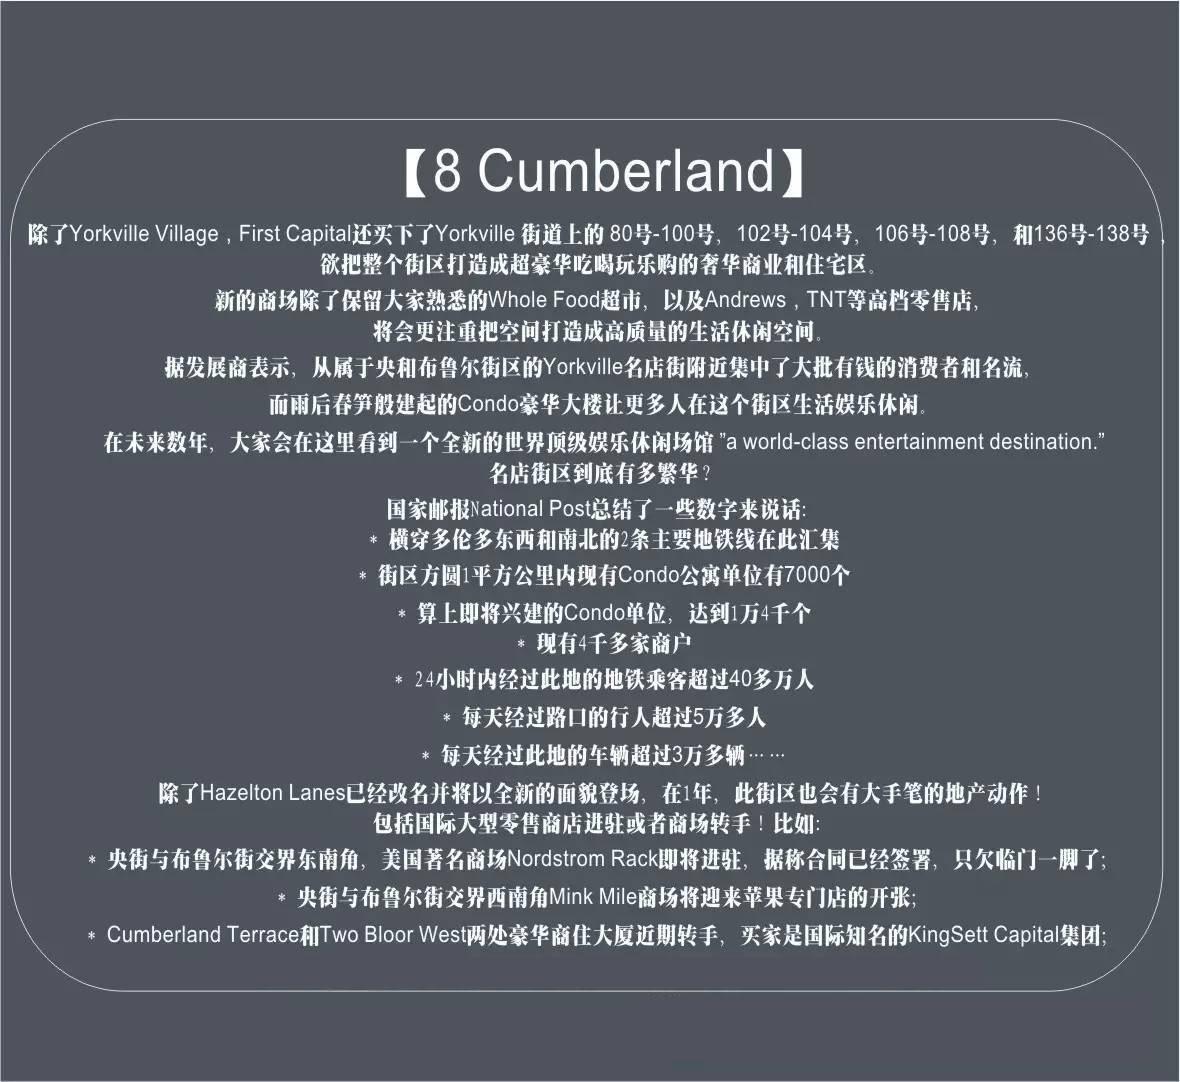 8 cumberland